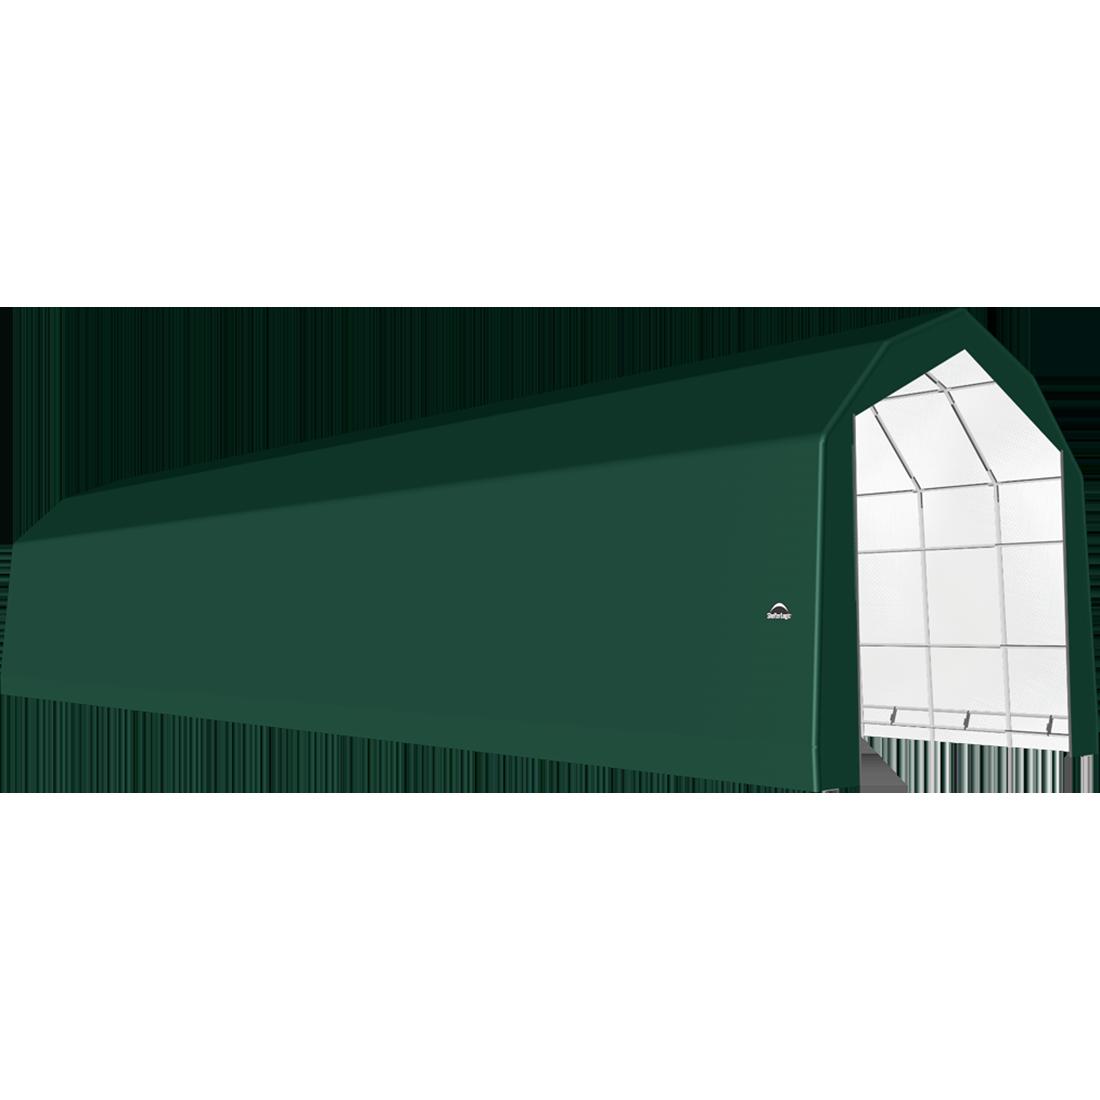 ShelterTech SP Series Barn Shelter, 20 ft. x 72 ft. x 18 ft. Heavy Duty PVC 14.5 oz. Green